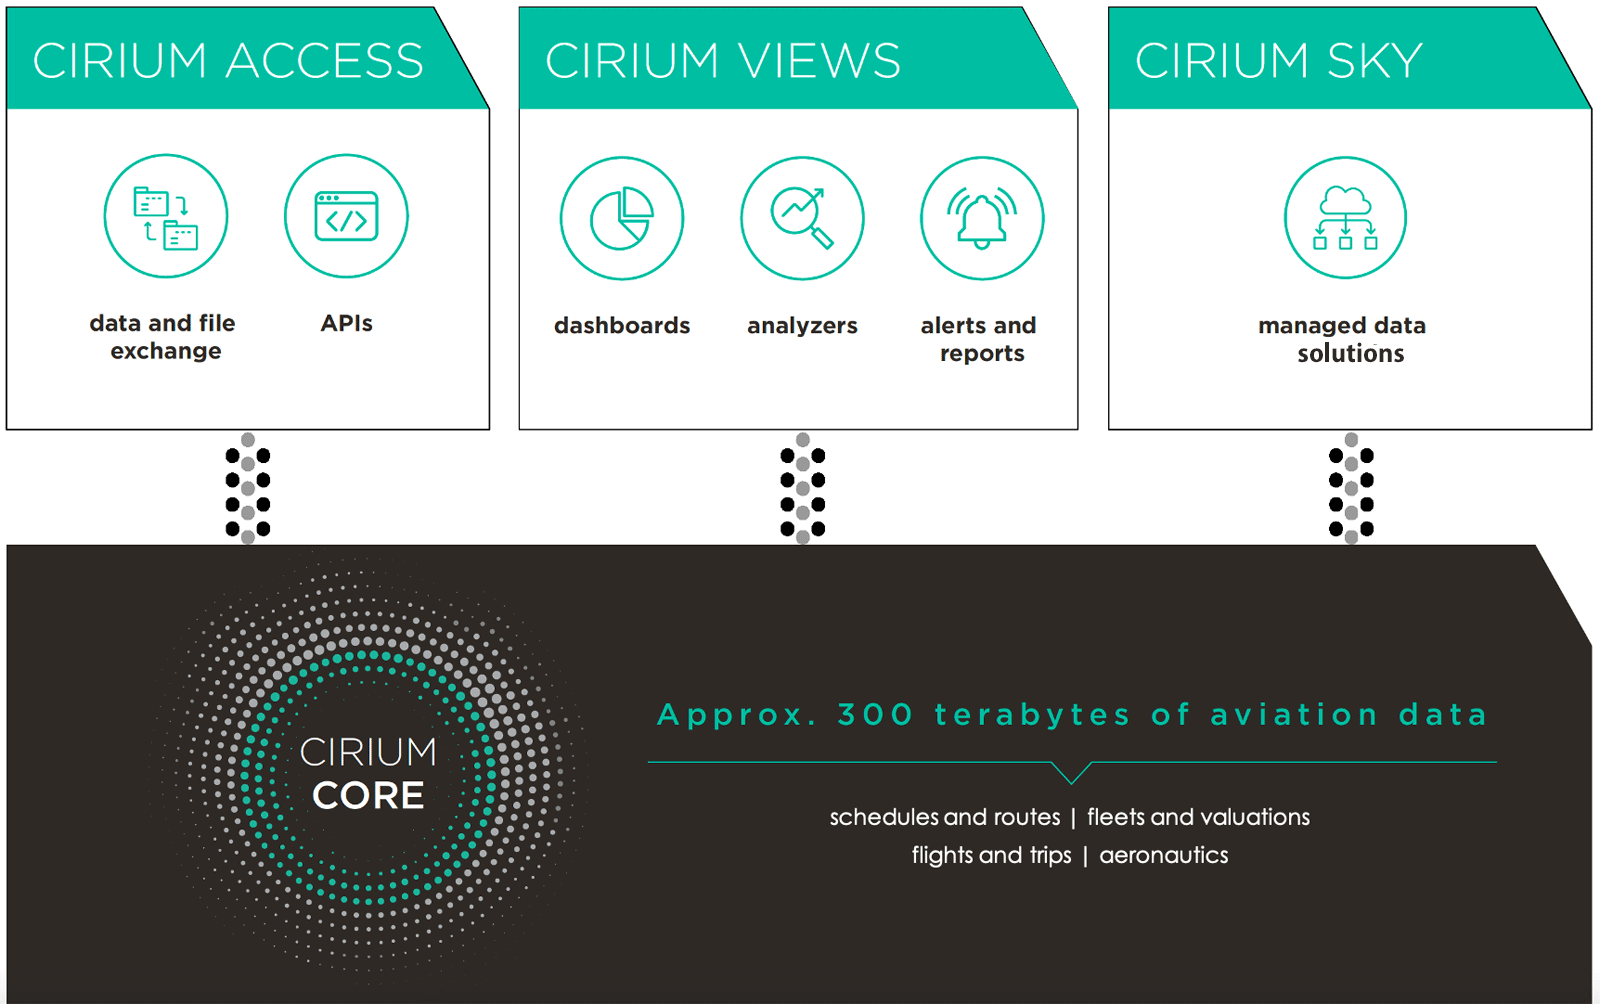 The Cirium Core aviation and travel data diagram